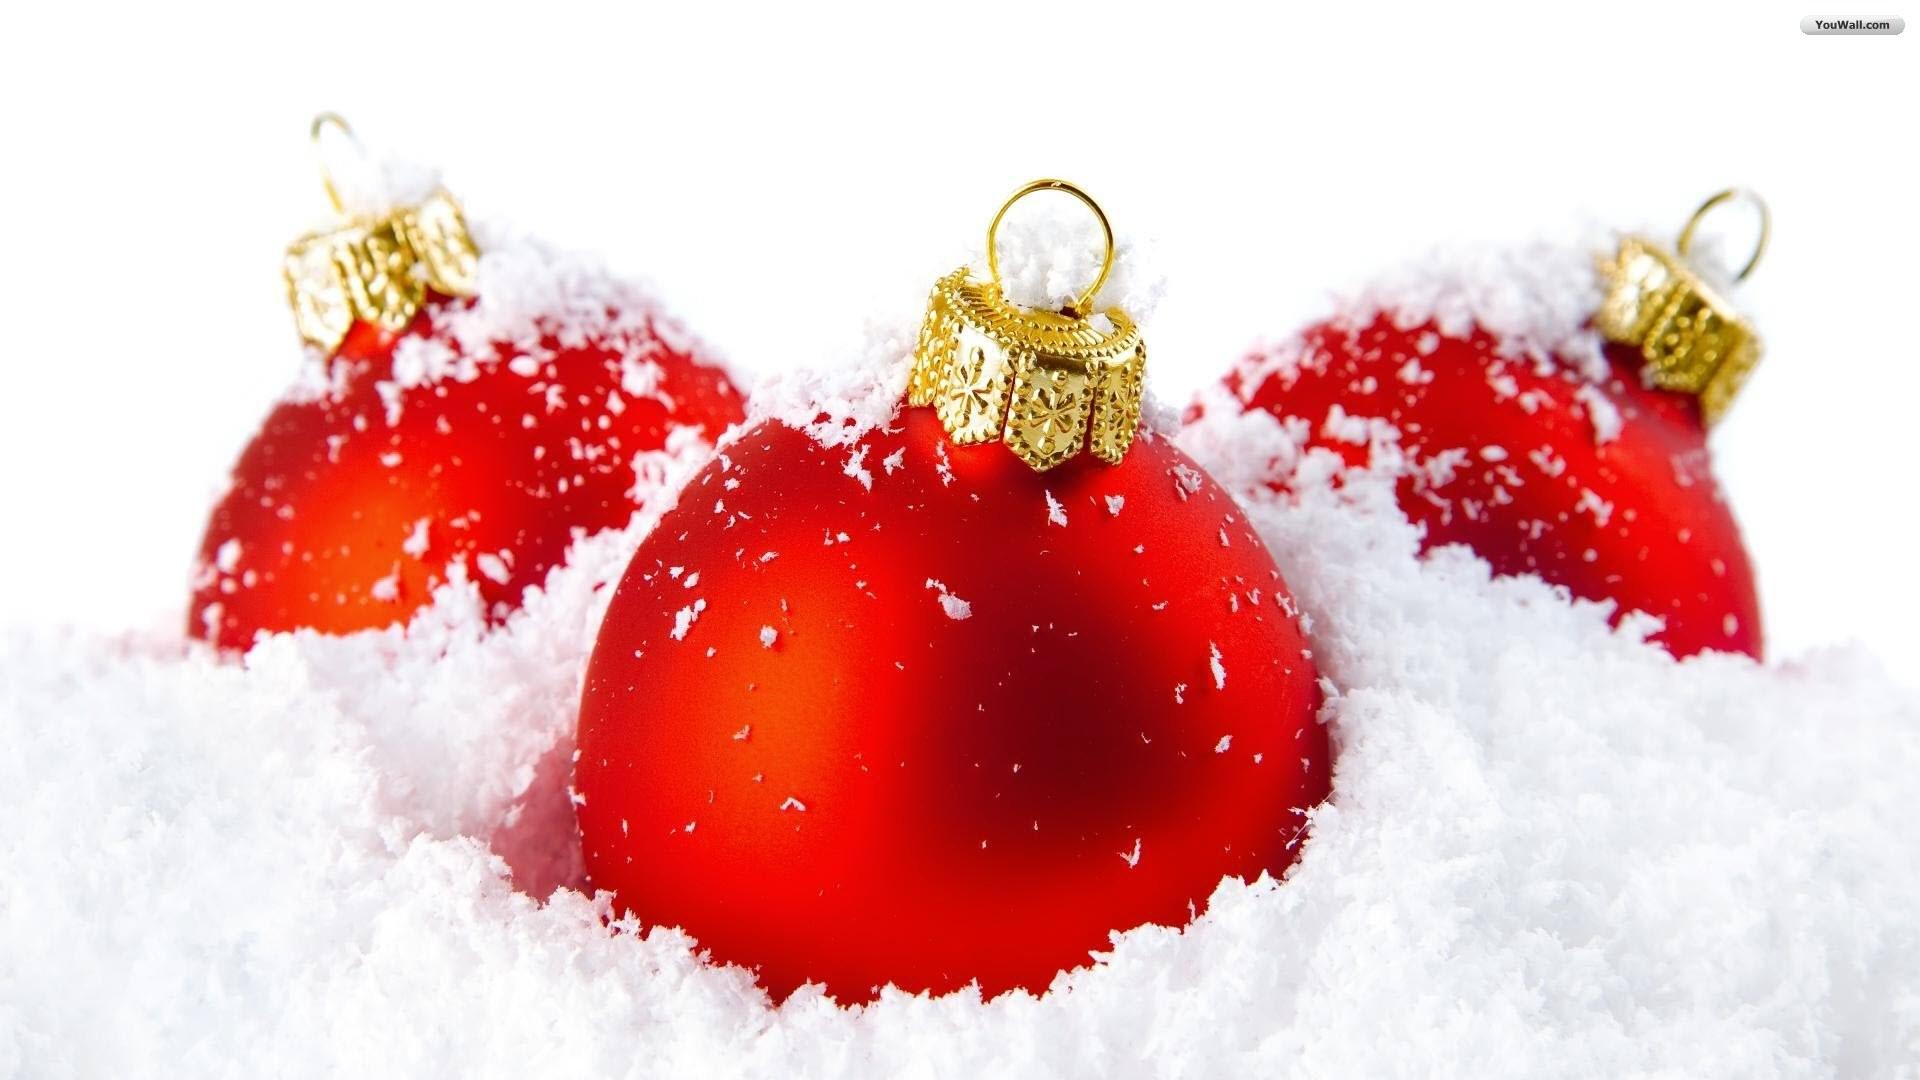 Thomas Kinkade Christmas Ornaments